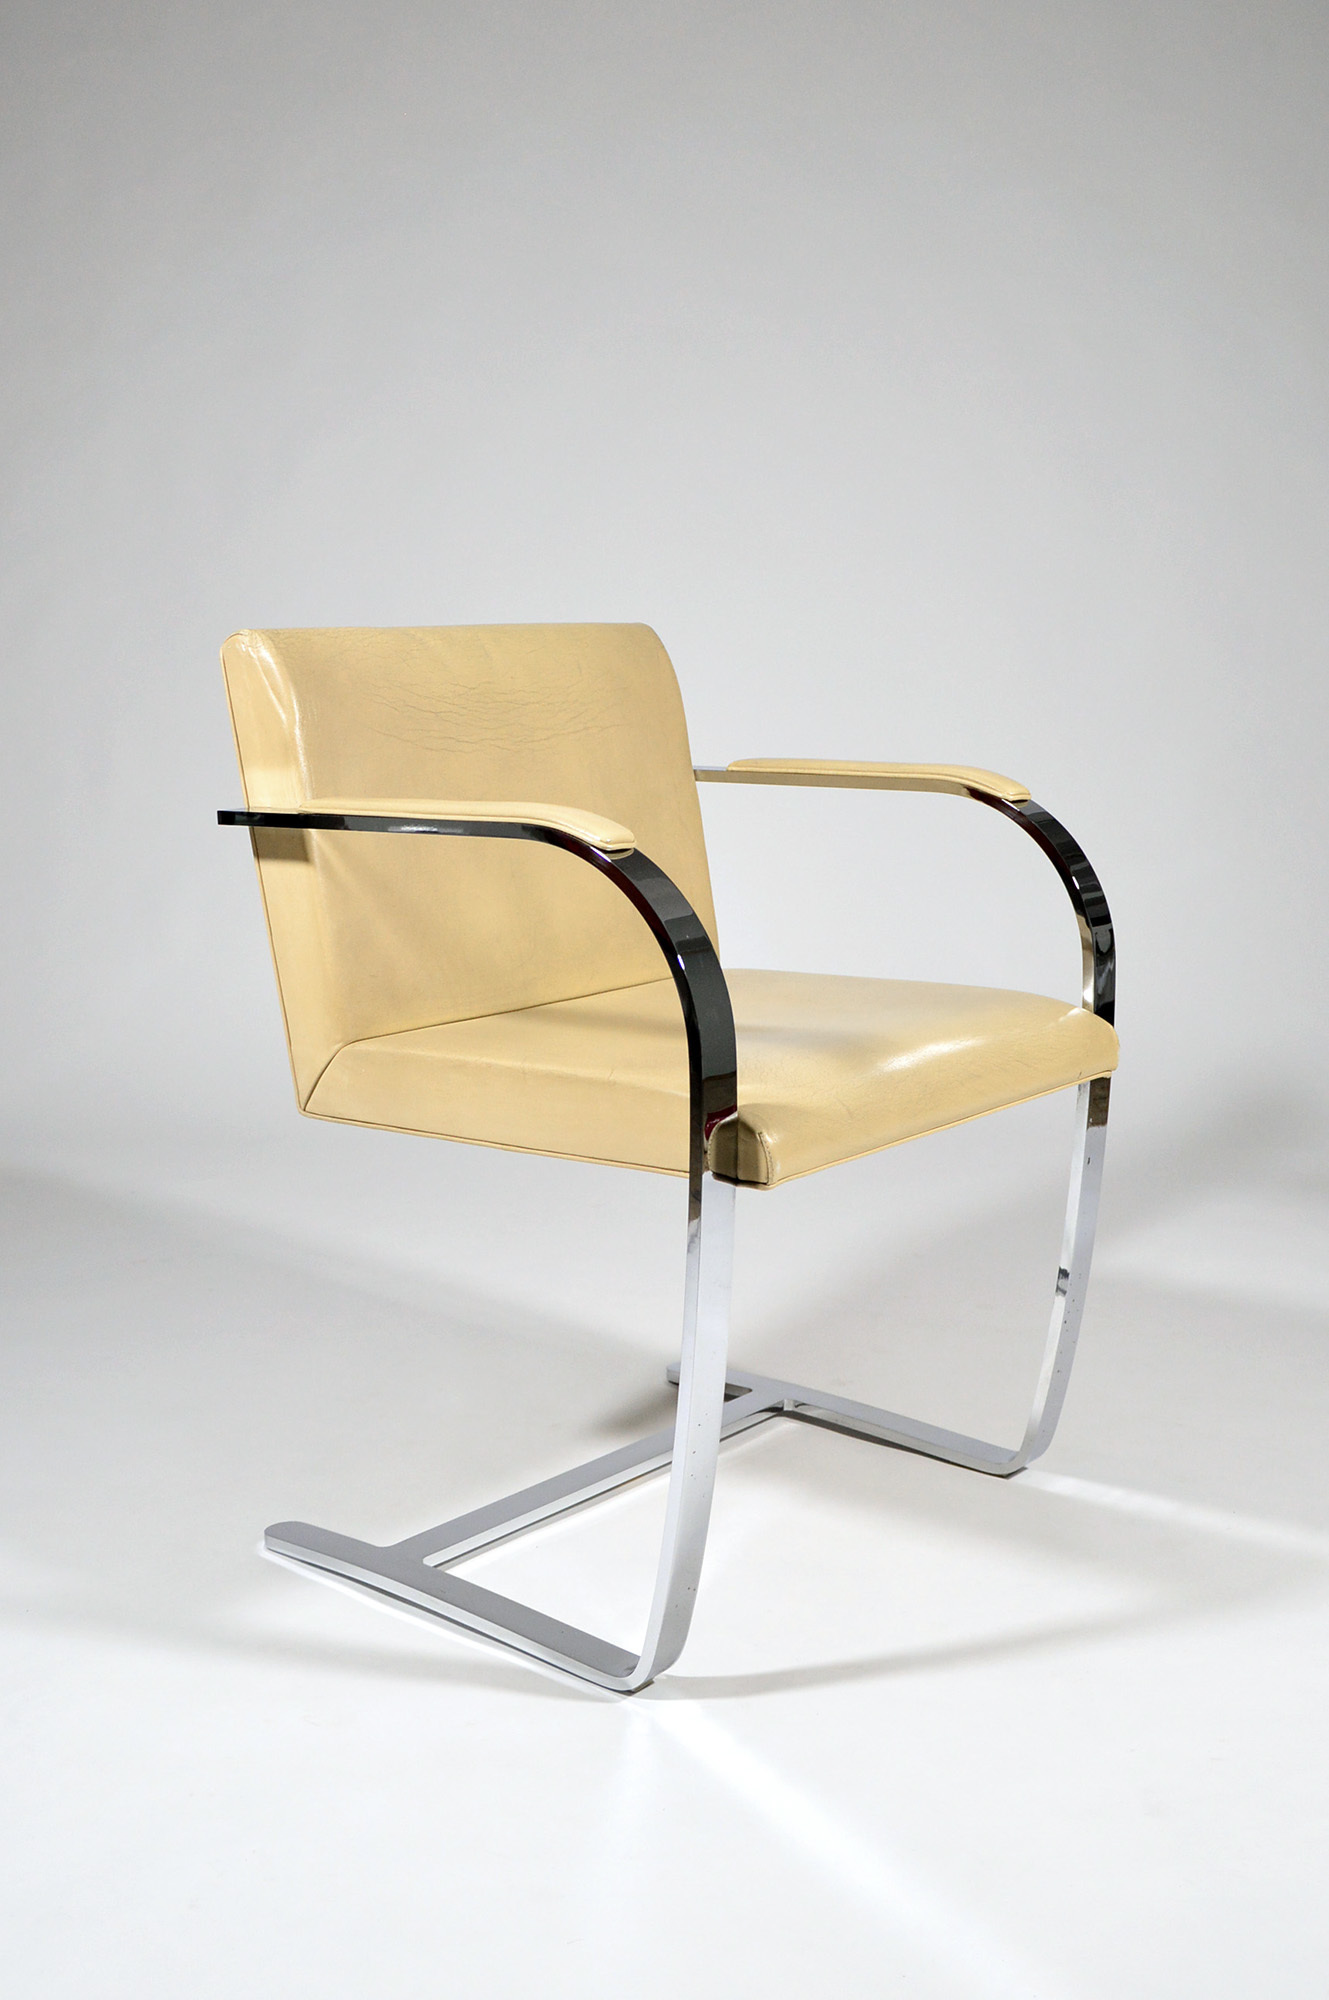 Chaise Brno Mies Van Der Rohe brno flat bar chairludwig mies van der rohe for knoll, 1930, 4/6